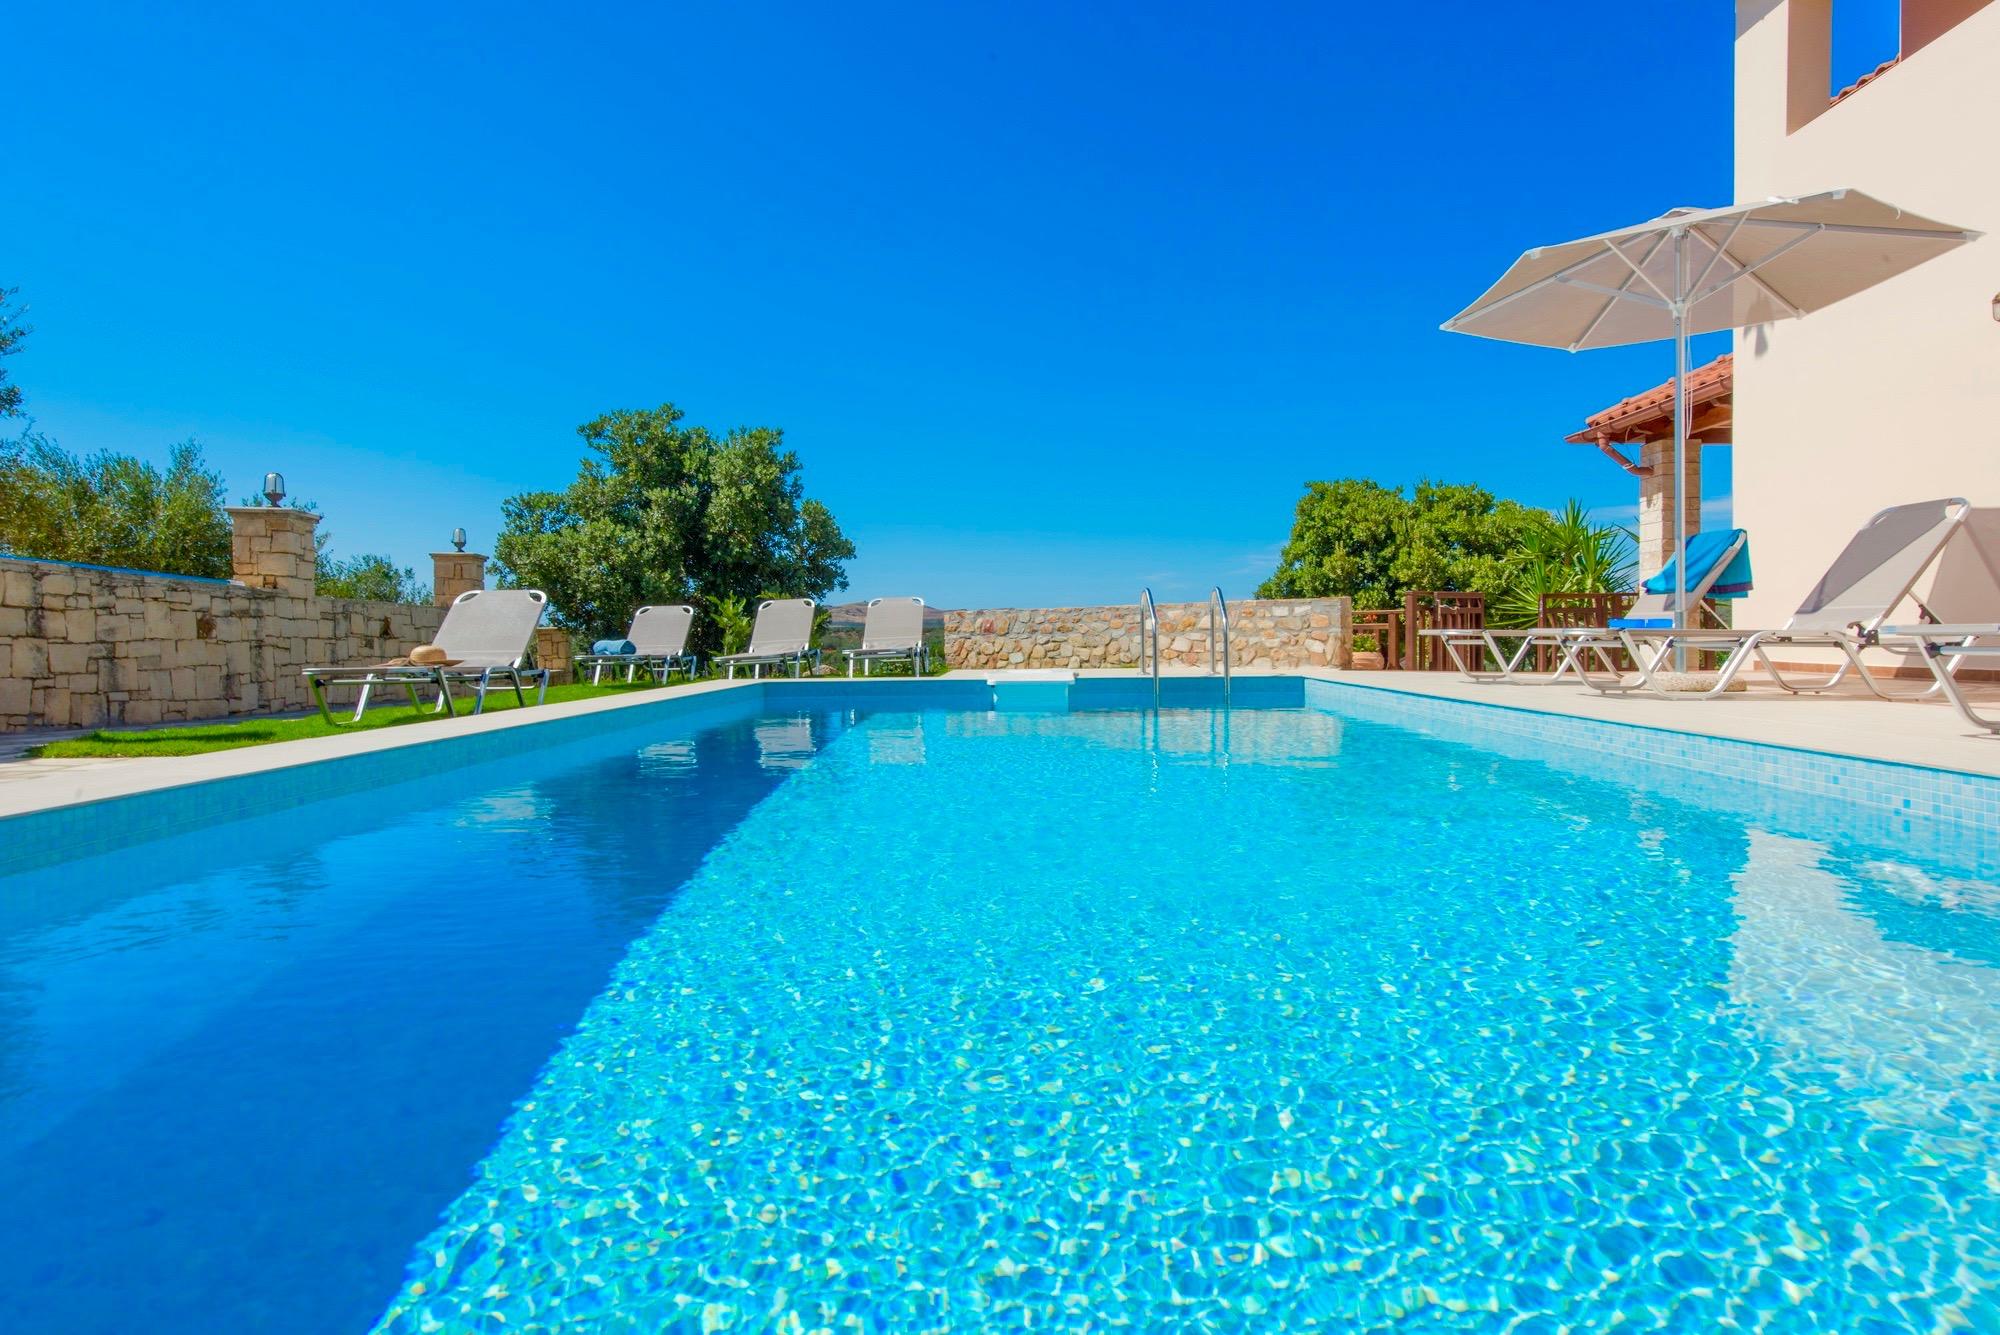 Ferienhaus Luxury Villa Korini with private swimming pool (2470495), Roumeli, Kreta Nordküste, Kreta, Griechenland, Bild 12